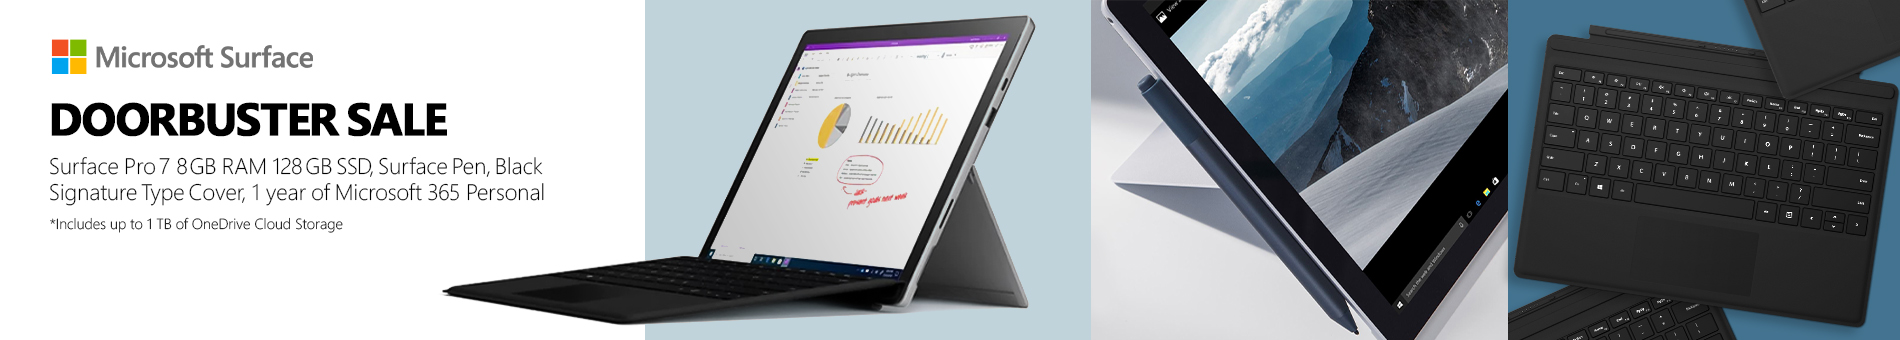 Microsoft Surface Pro7 Doorbuster 07.21.21banner